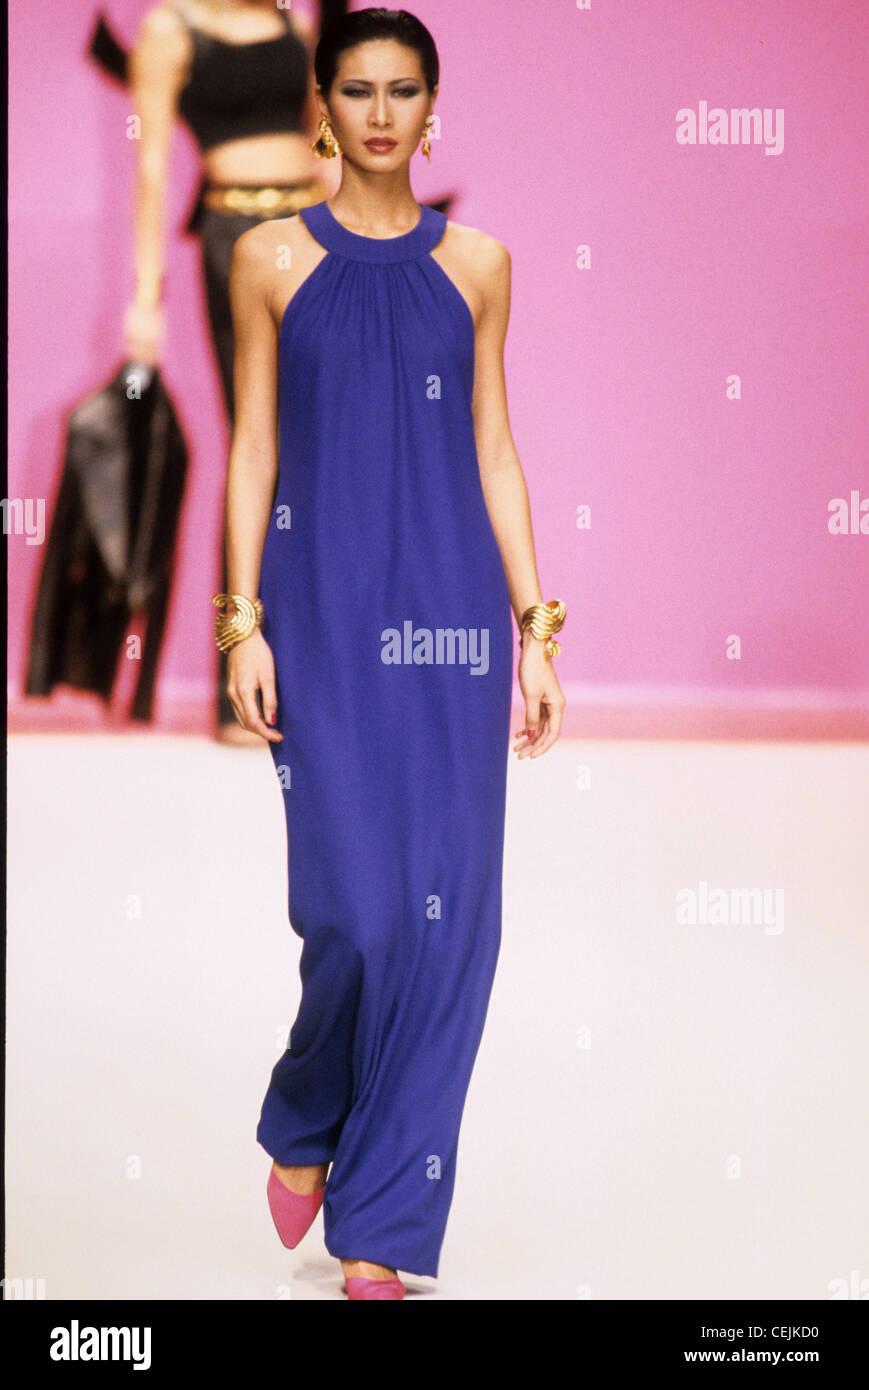 8e4e730bca6 Yves Saint Laurent Spring Summer Model wearing long dark blue halterneck  dress, accessorized with gold bracelets